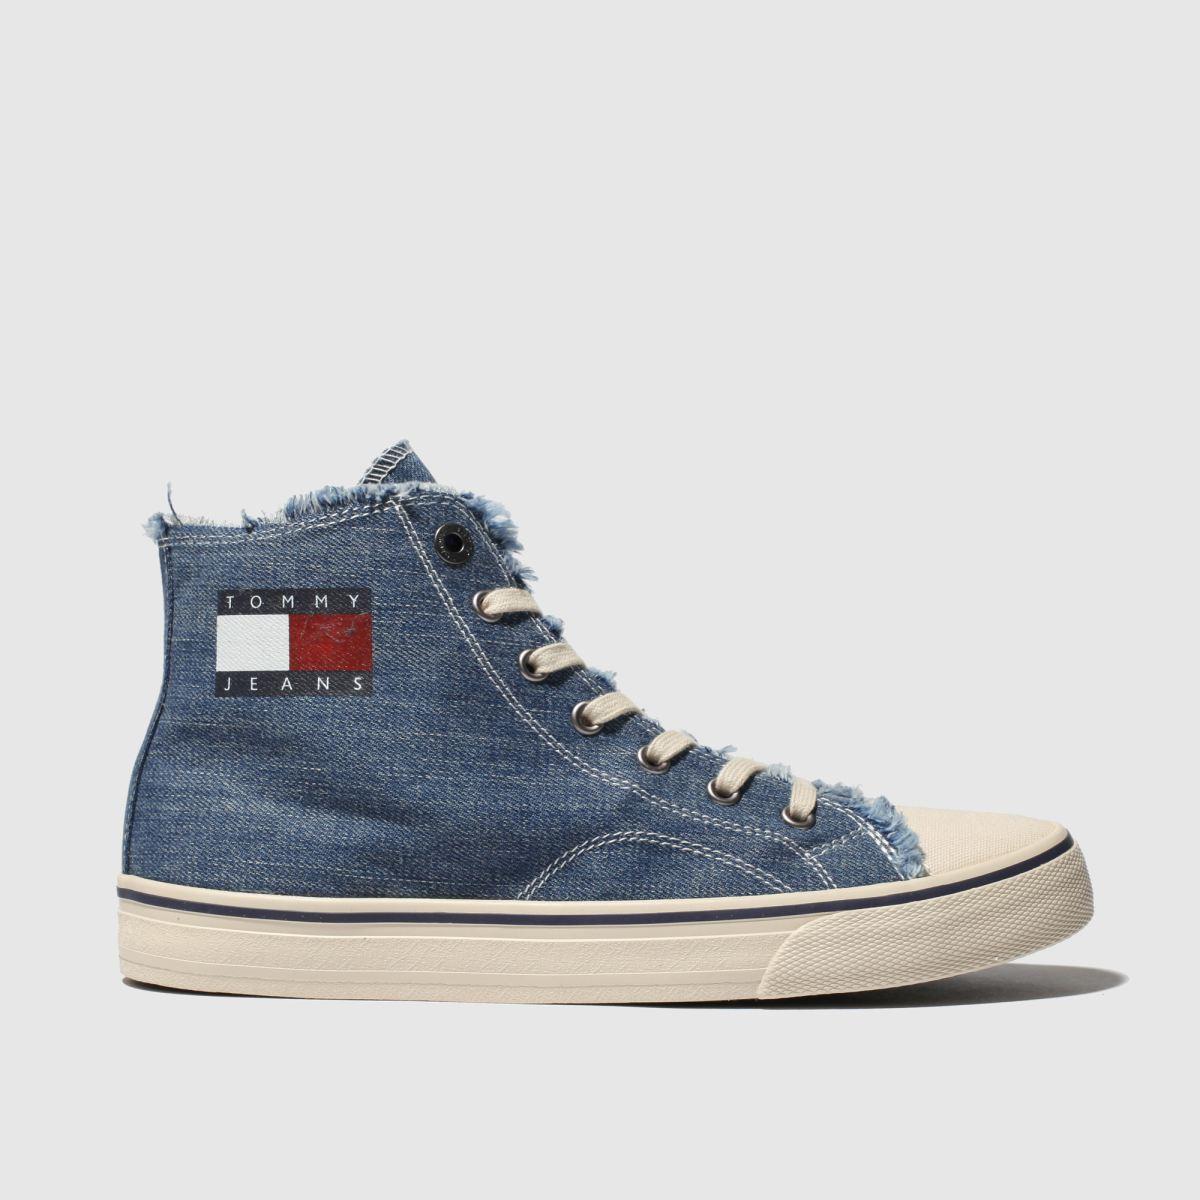 Tommy Hilfiger Blue Tj Hightop Flat Shoes